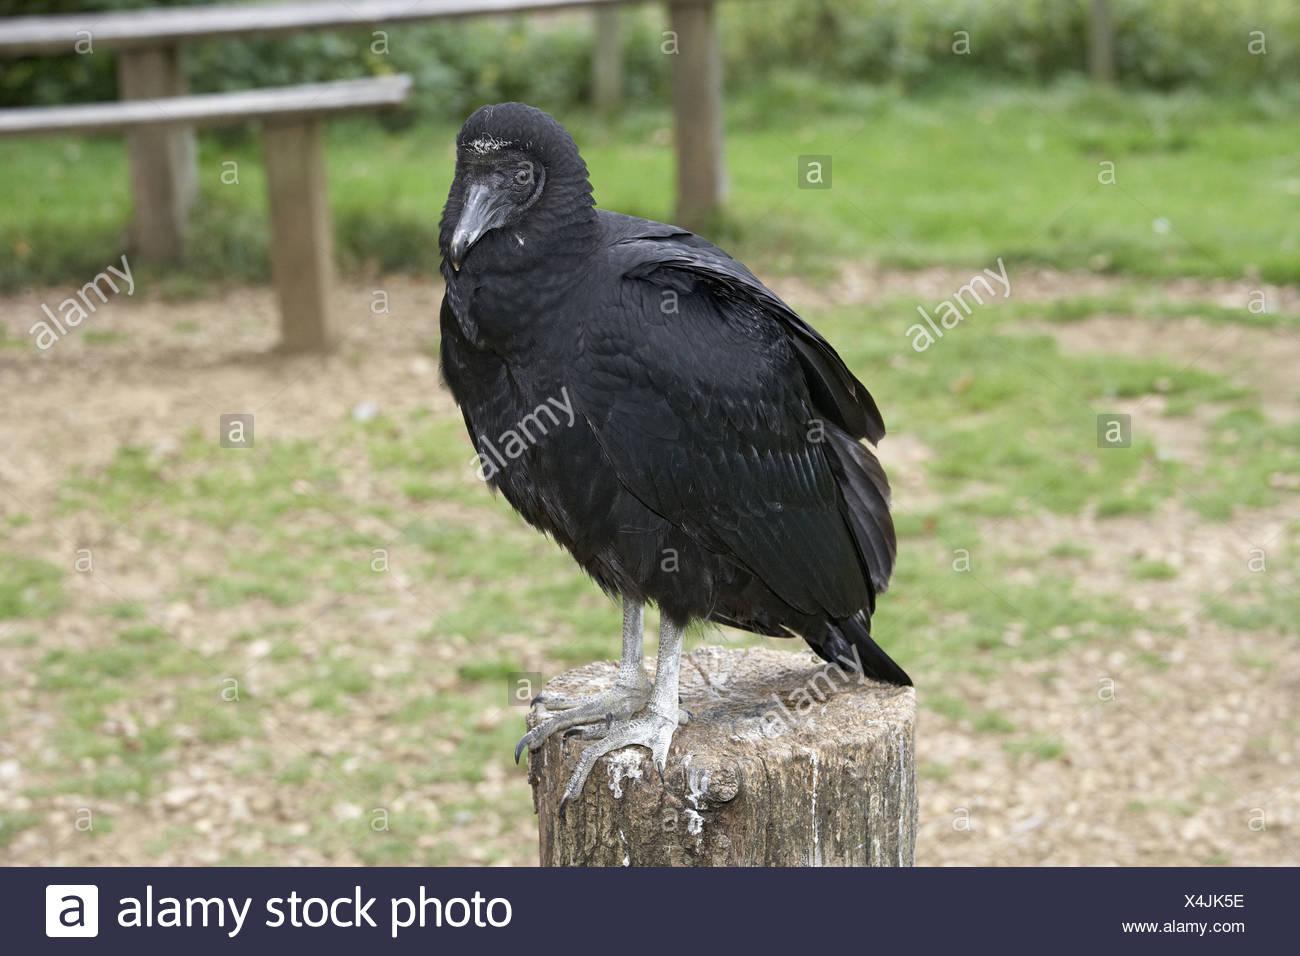 Black vulture (coragyps atratus) perching on tree stump - Stock Image